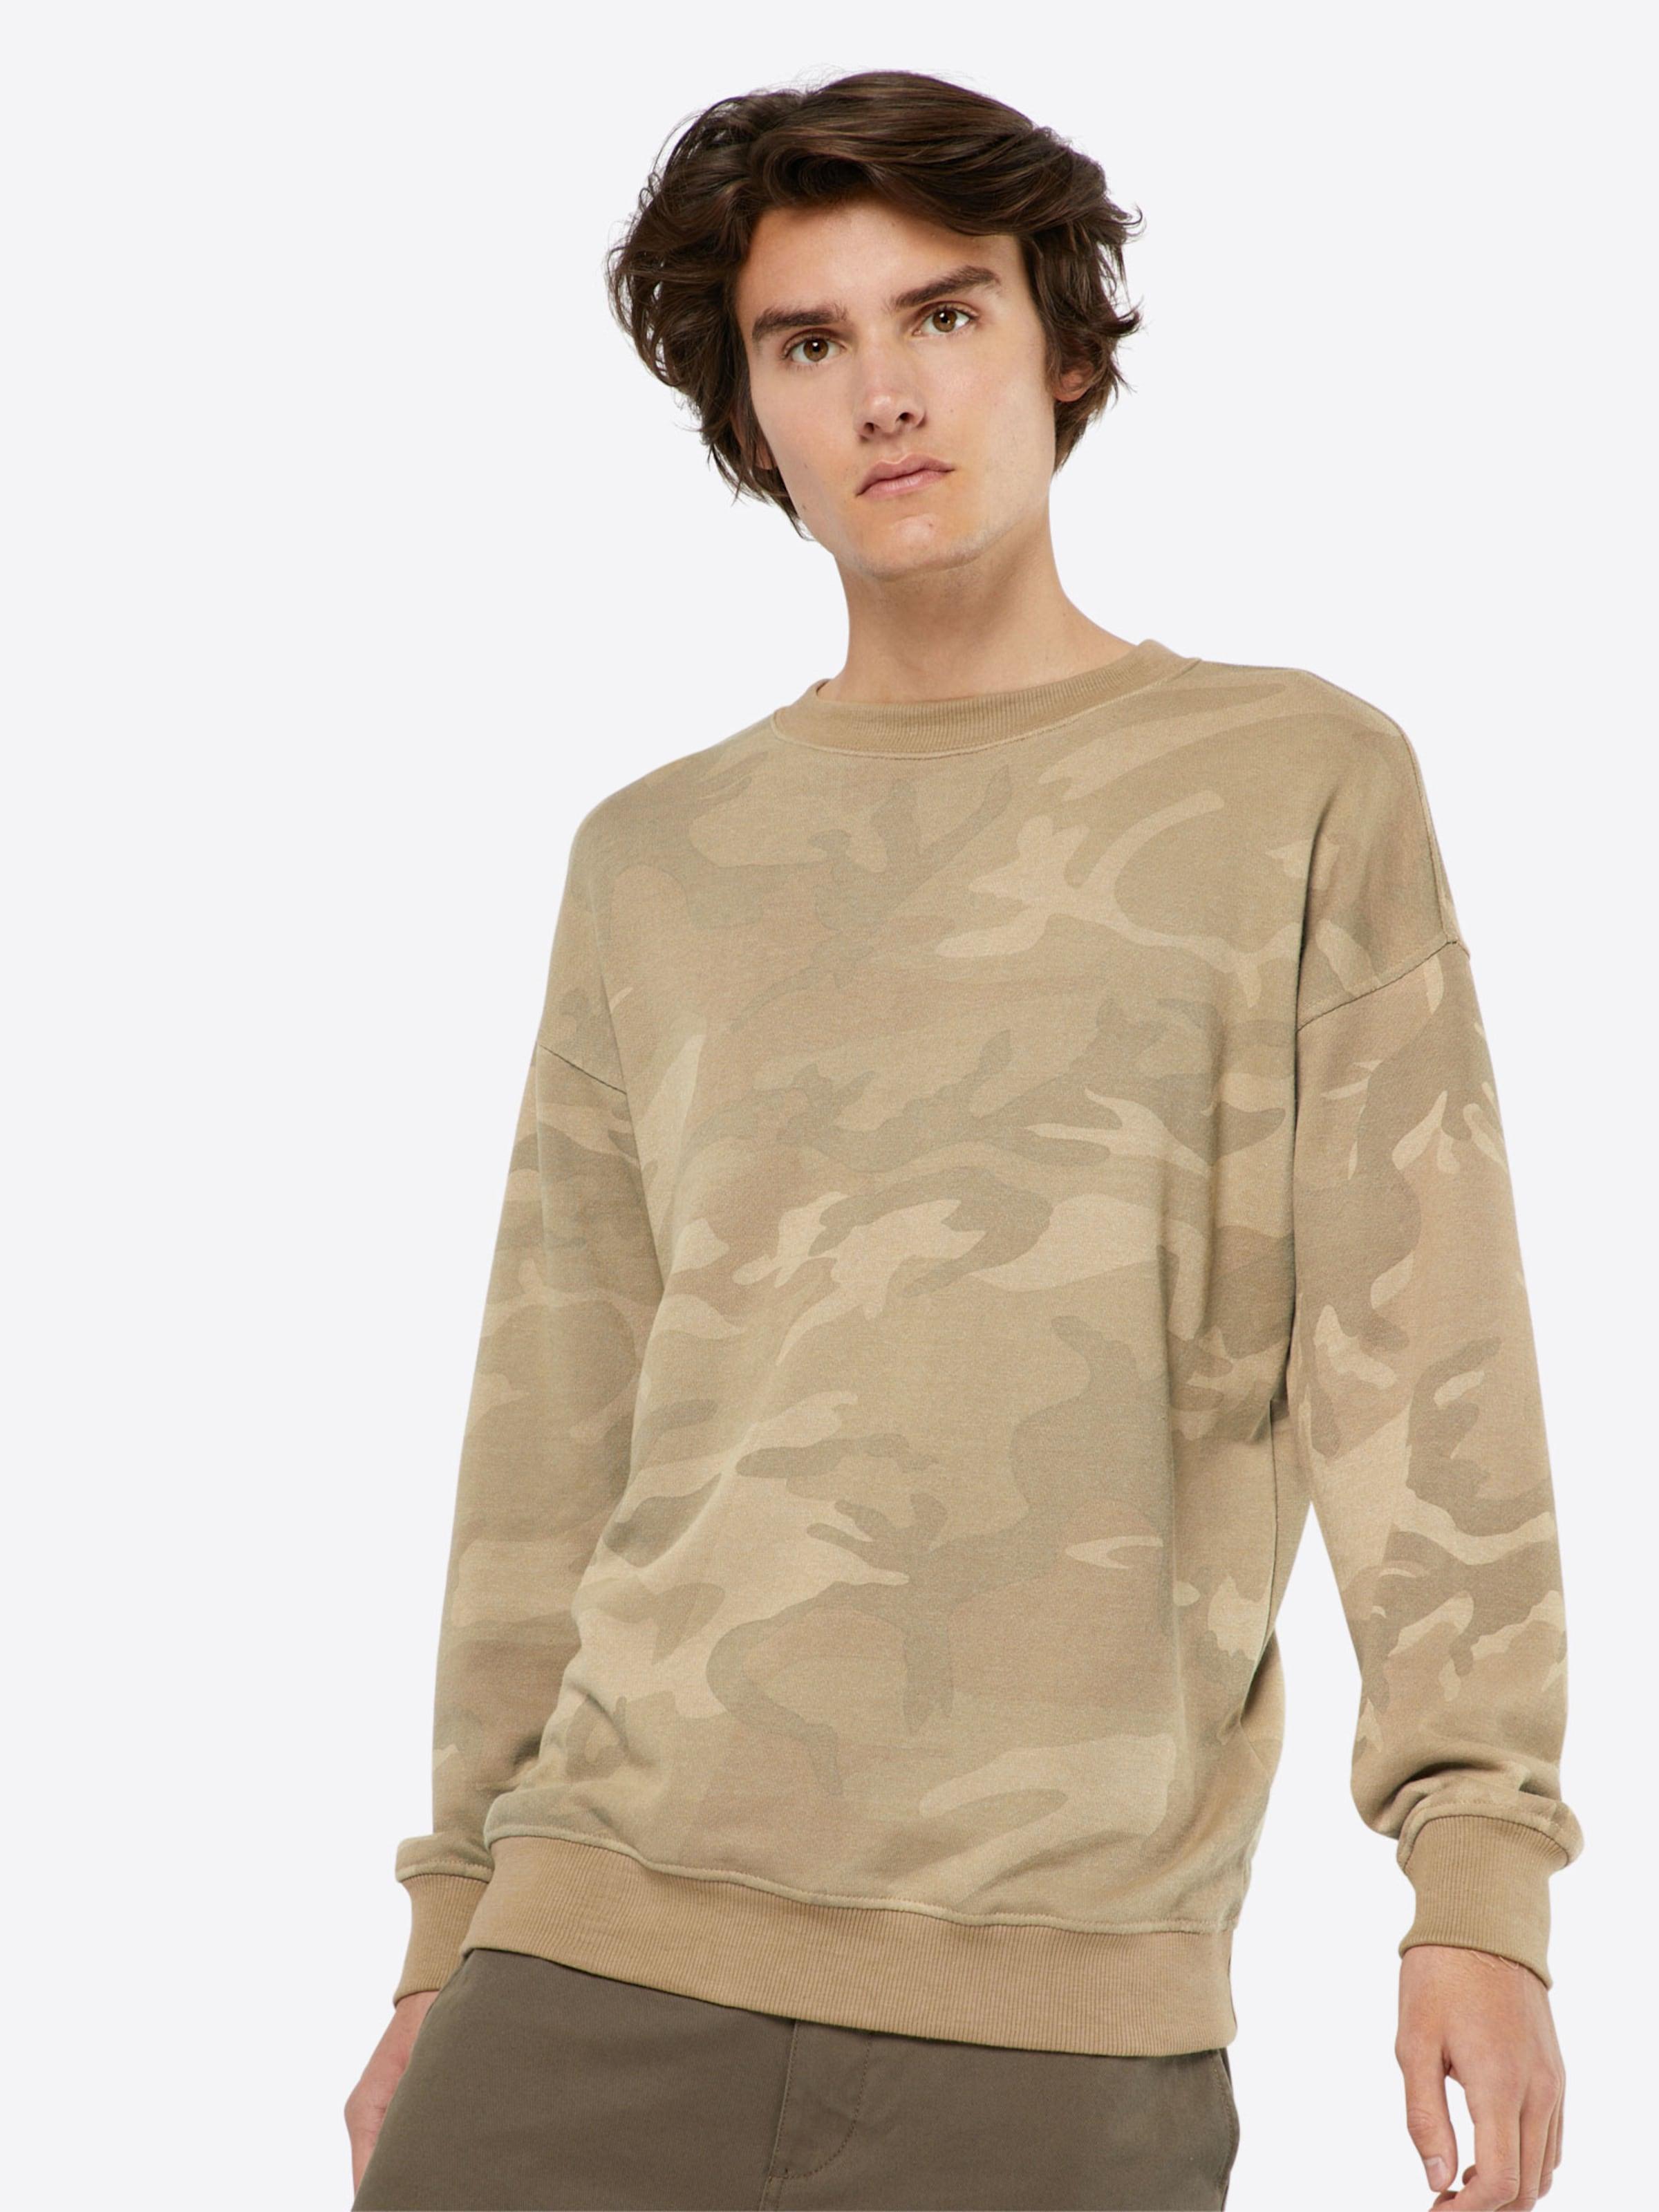 Sweater Classics Mit Crewneck In Sand Urban MpqGULSzV